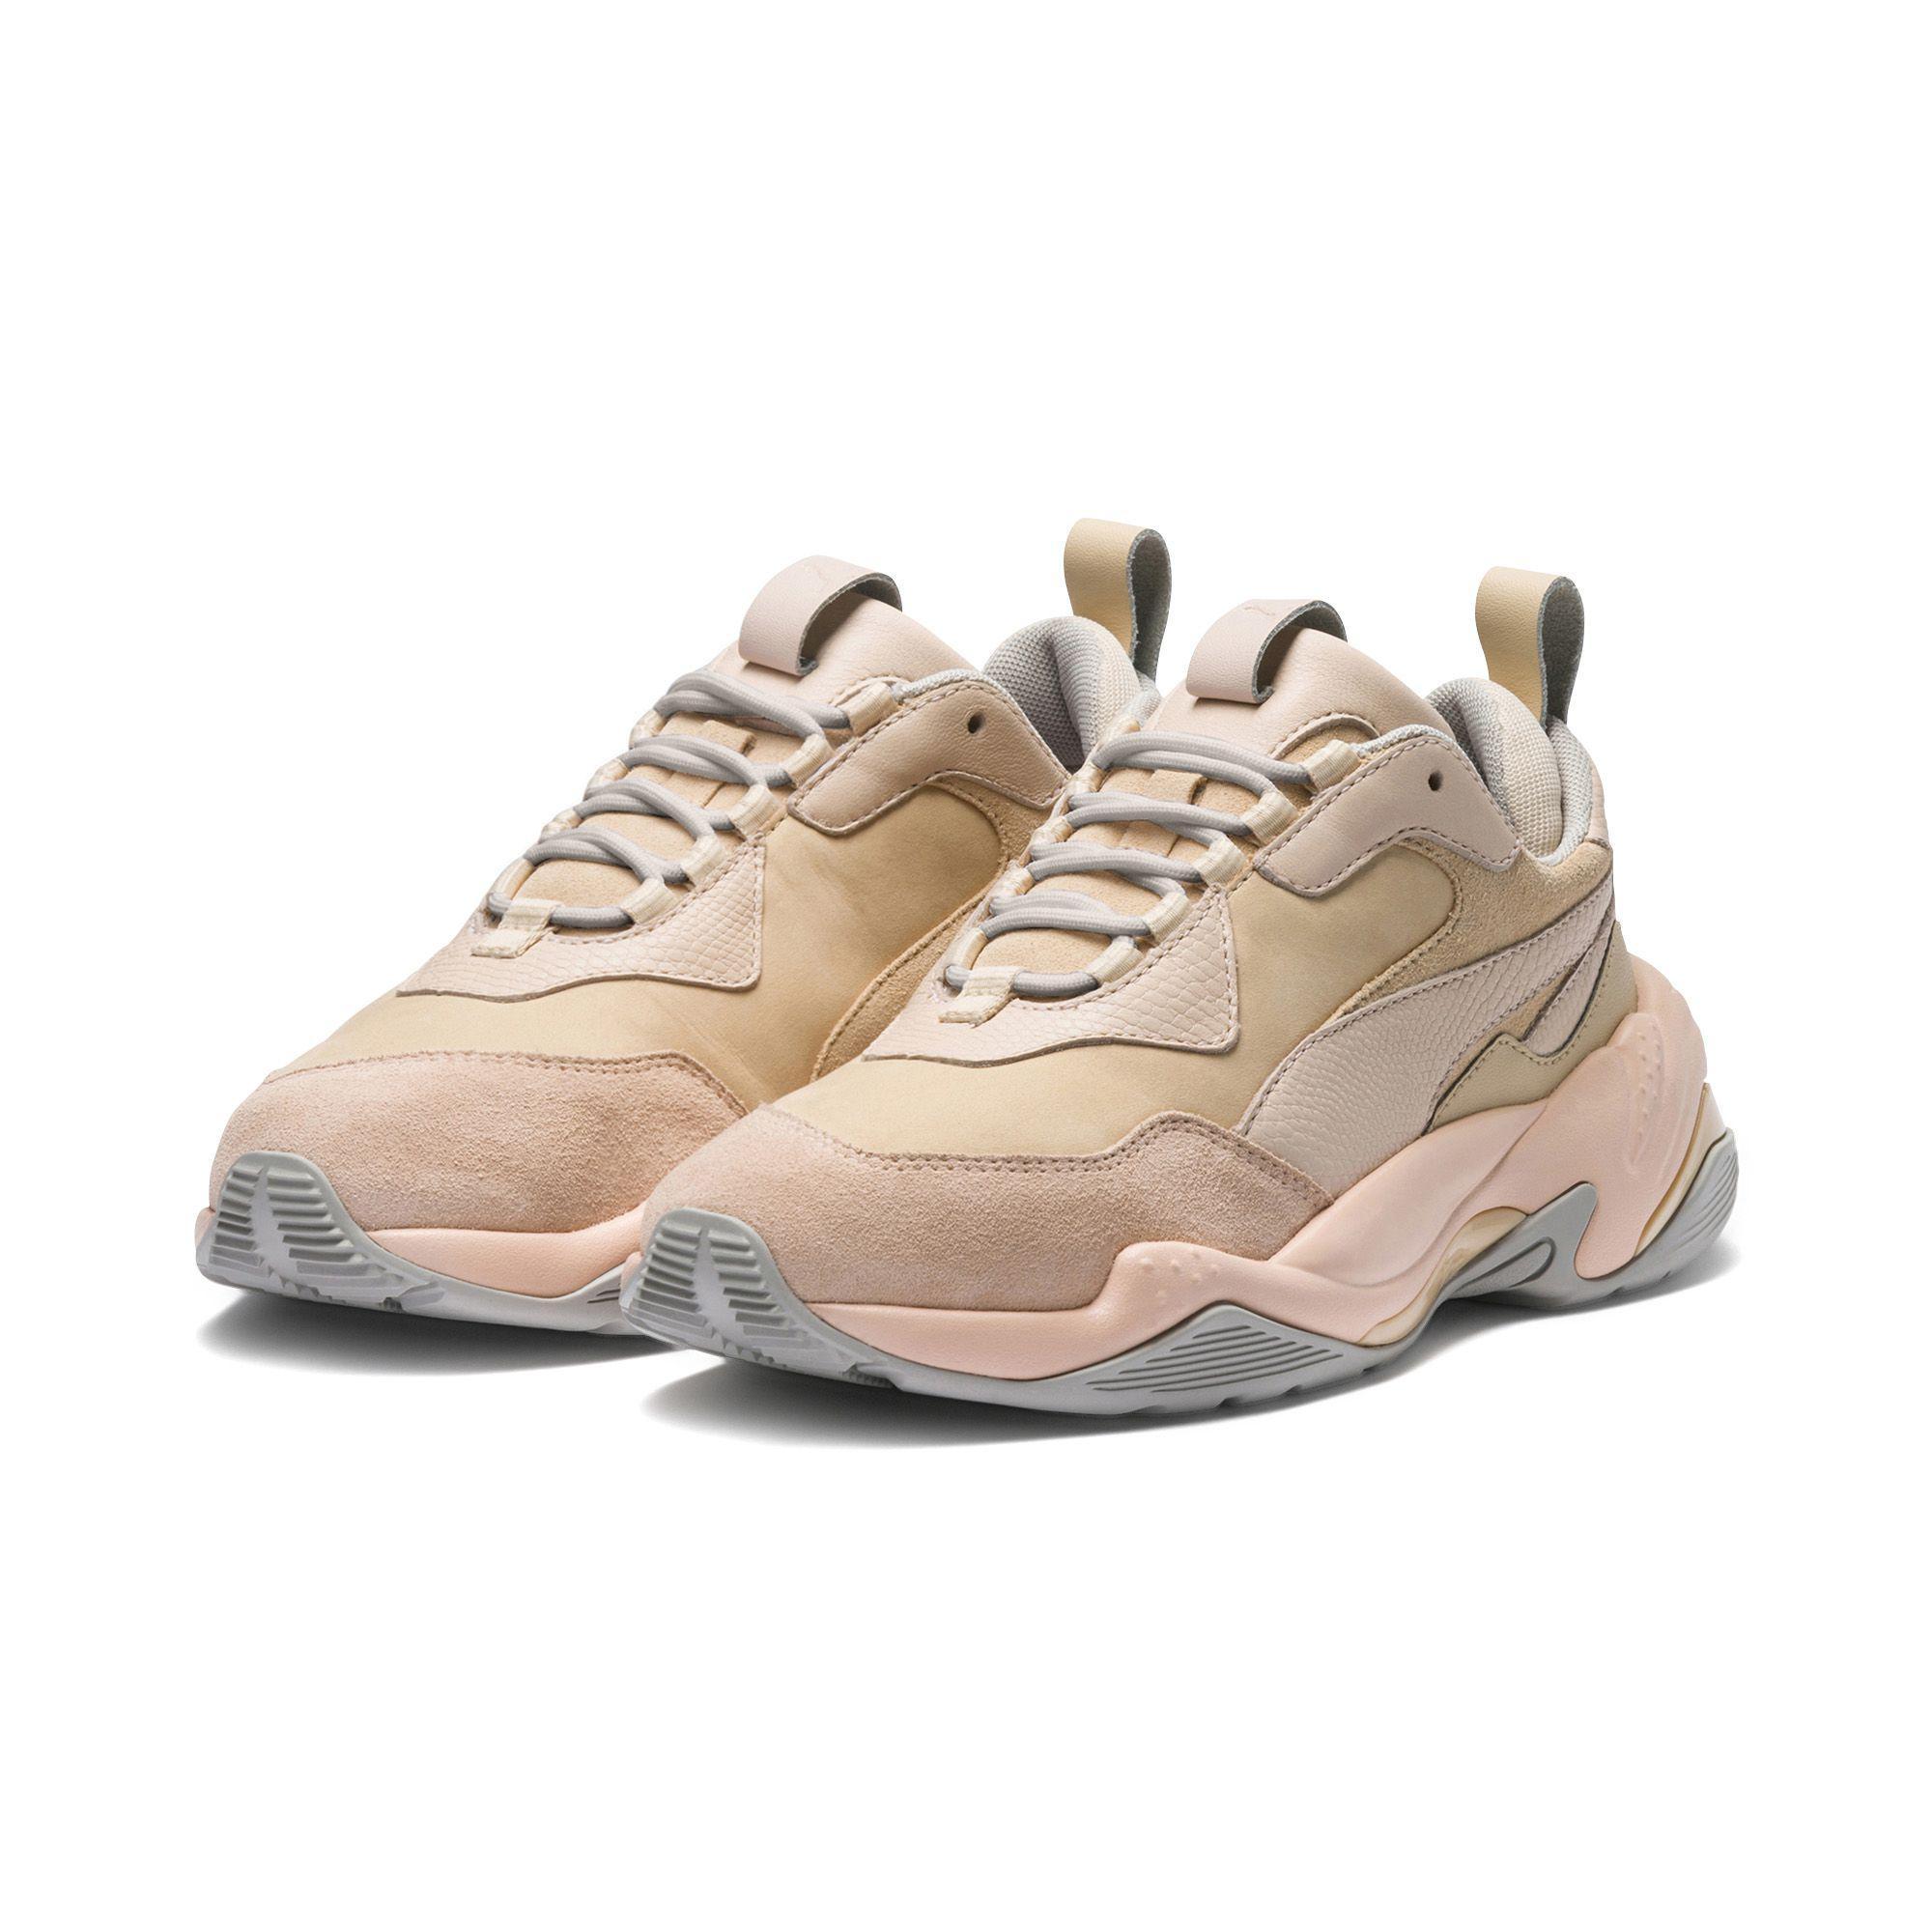 PUMA - Natural Thunder Desert Women s Sneakers - Lyst. View fullscreen 7259e2af3